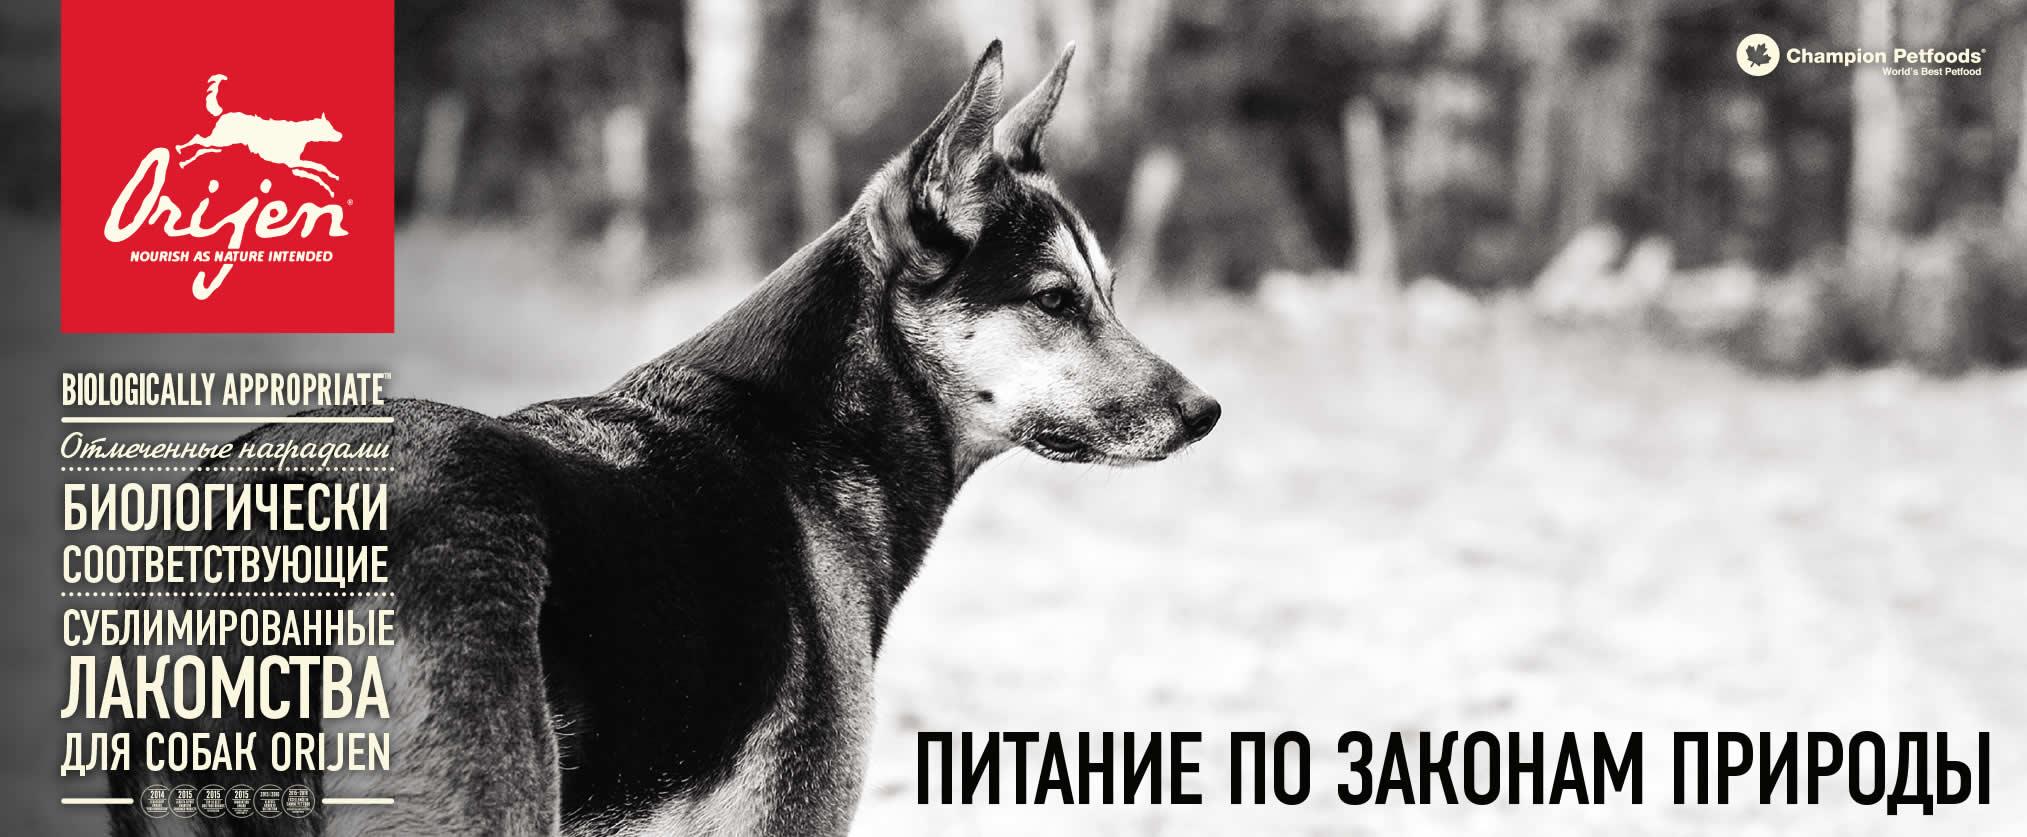 Лакомства для собак Orijen